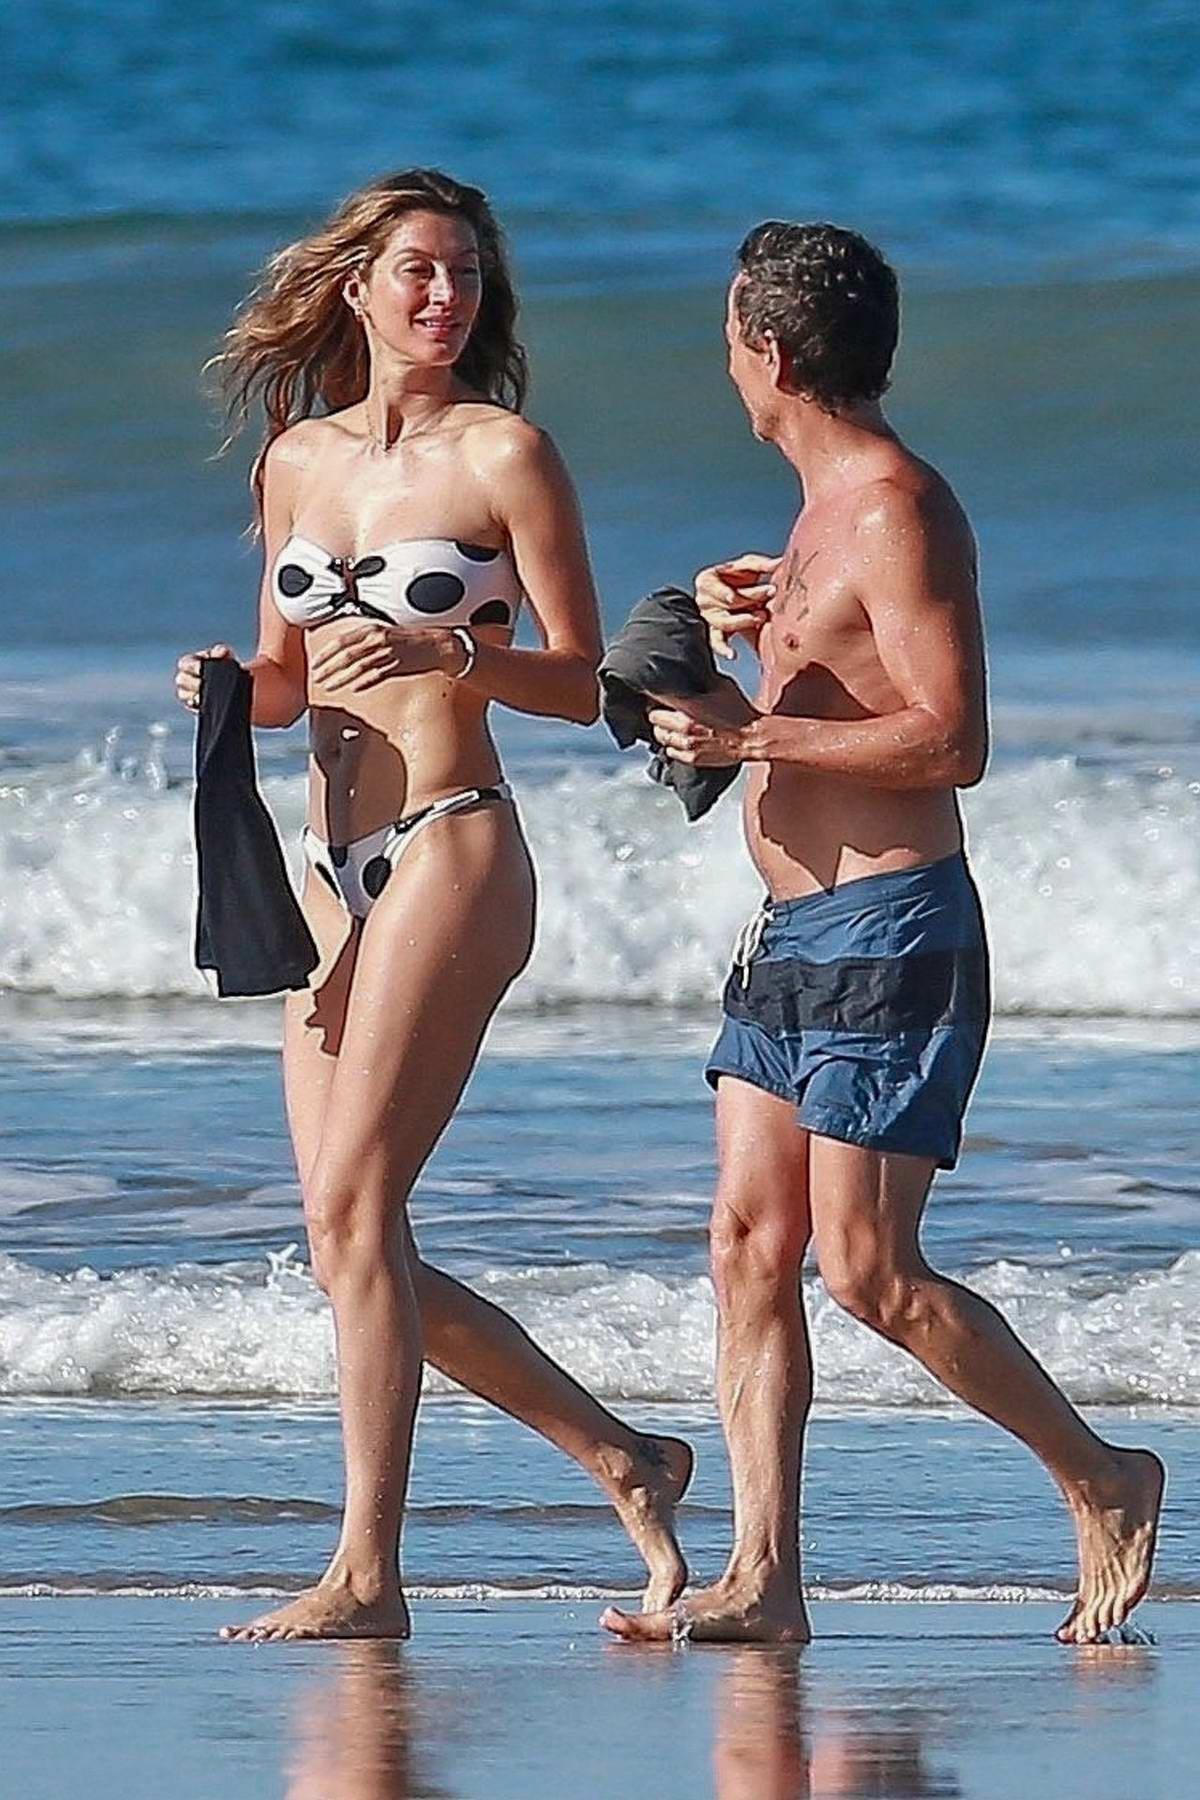 Gisele Bundchen hits the beach in a polka dot bikini during her vacation in Costa Rica